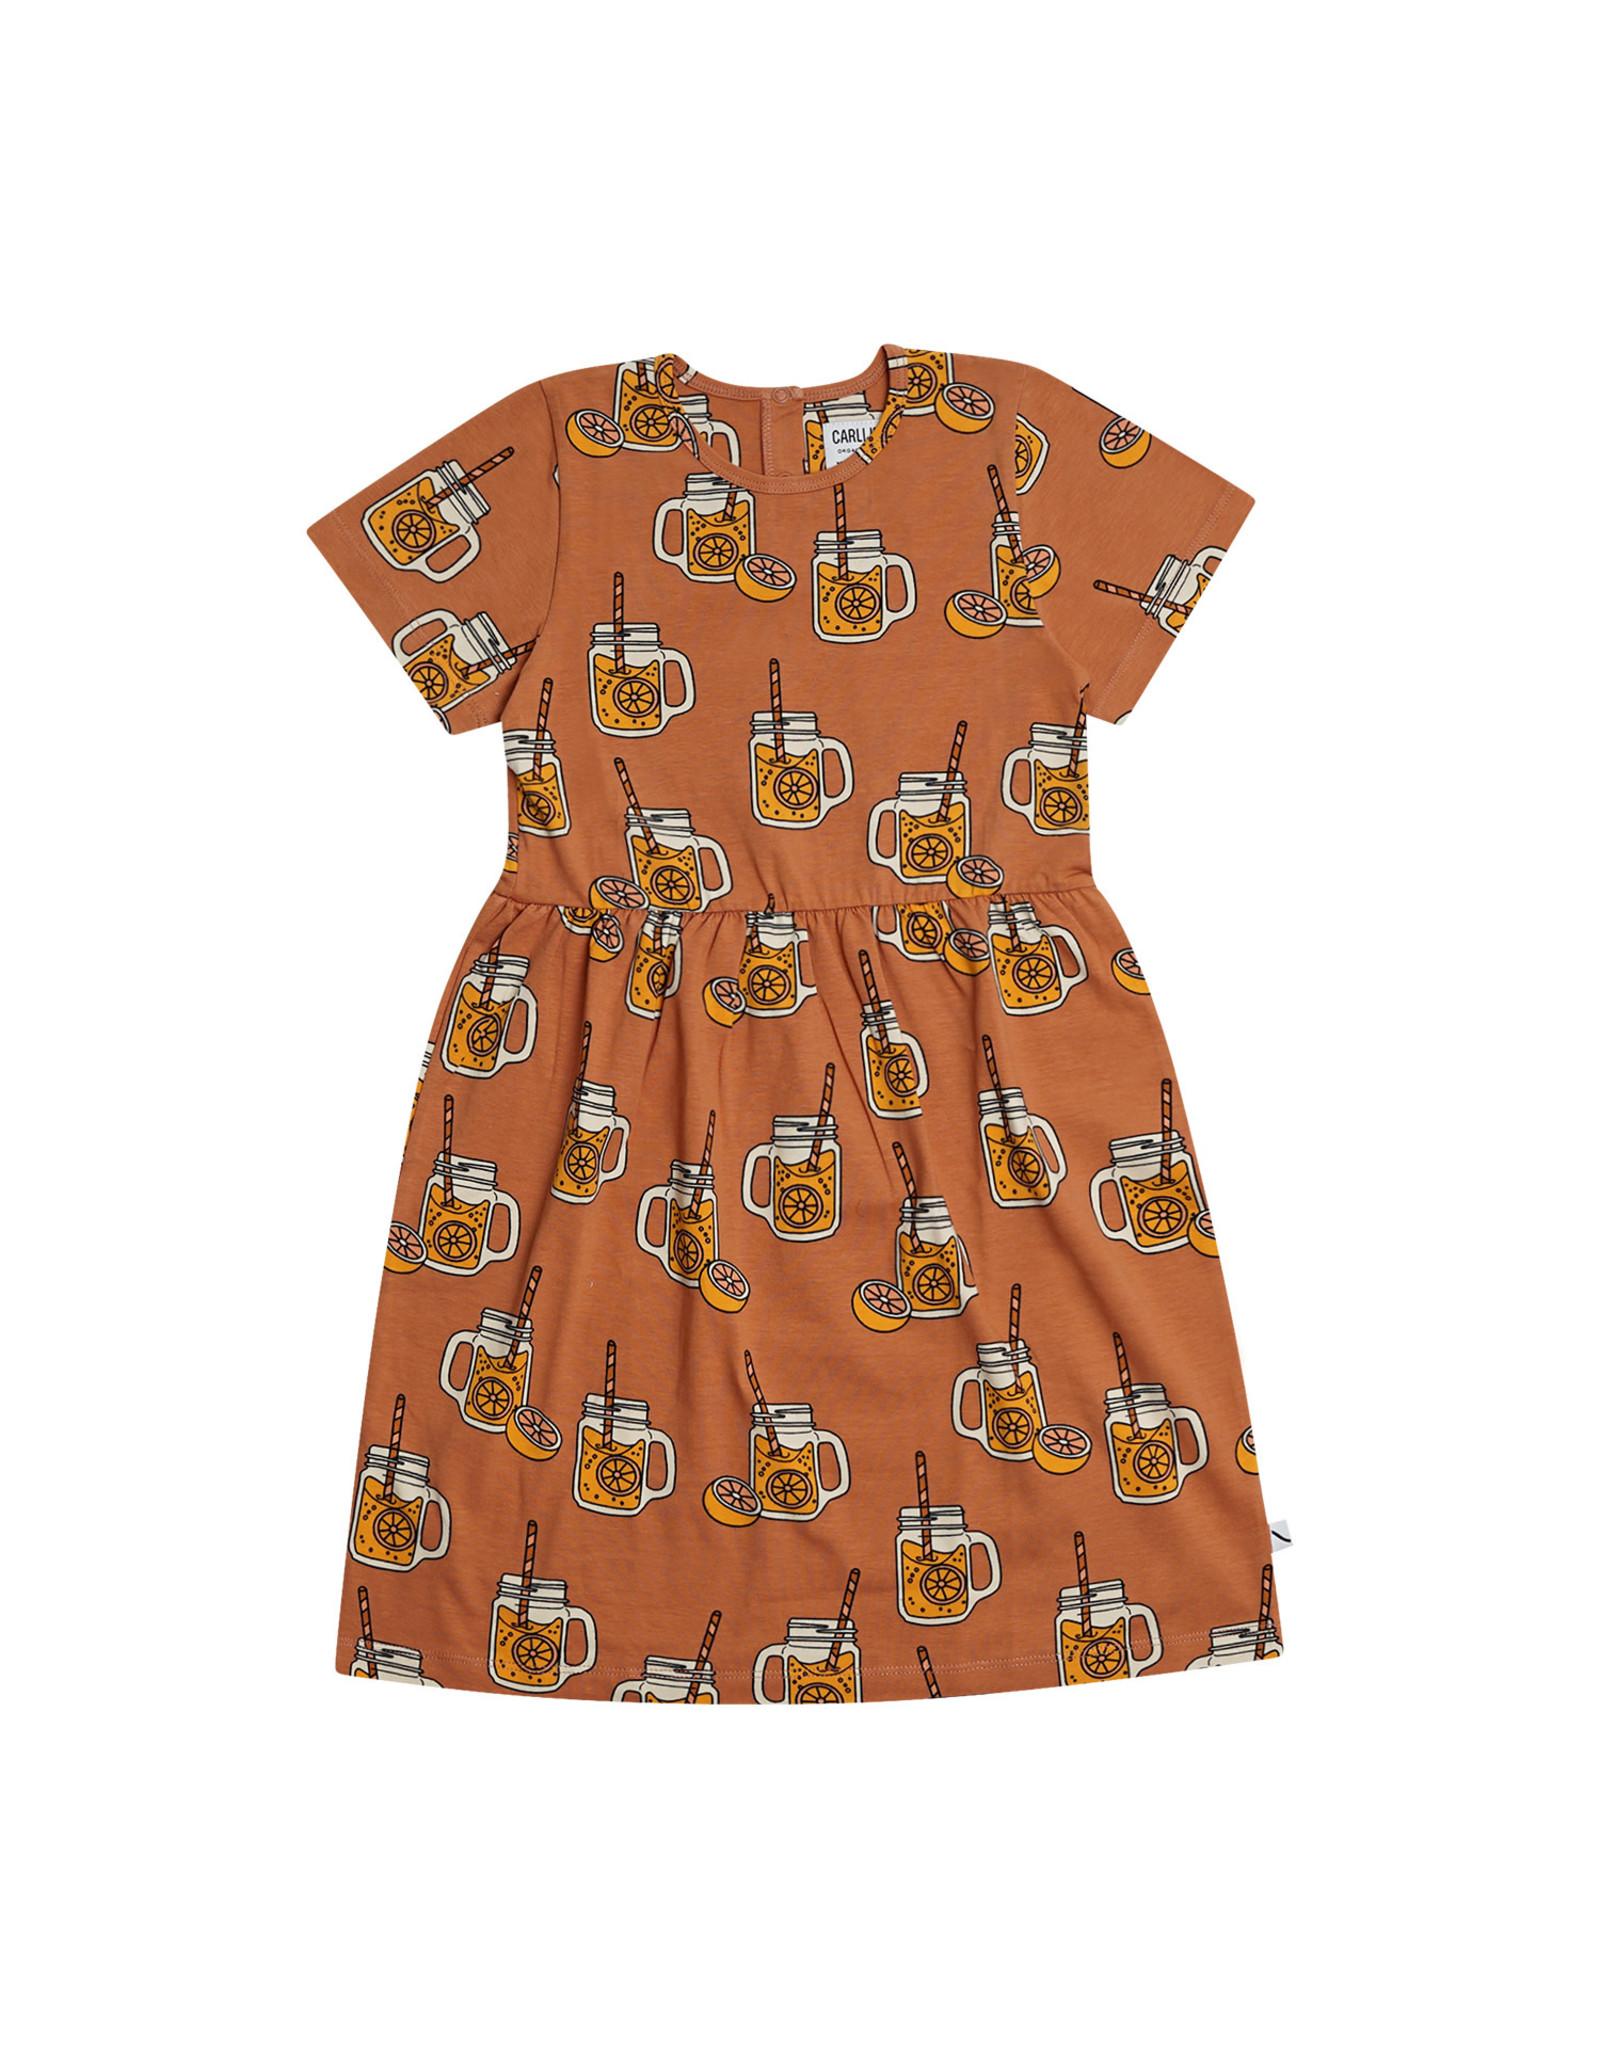 Carlijn Q Carlijn Q Lemonade - Dress Short Sleeve